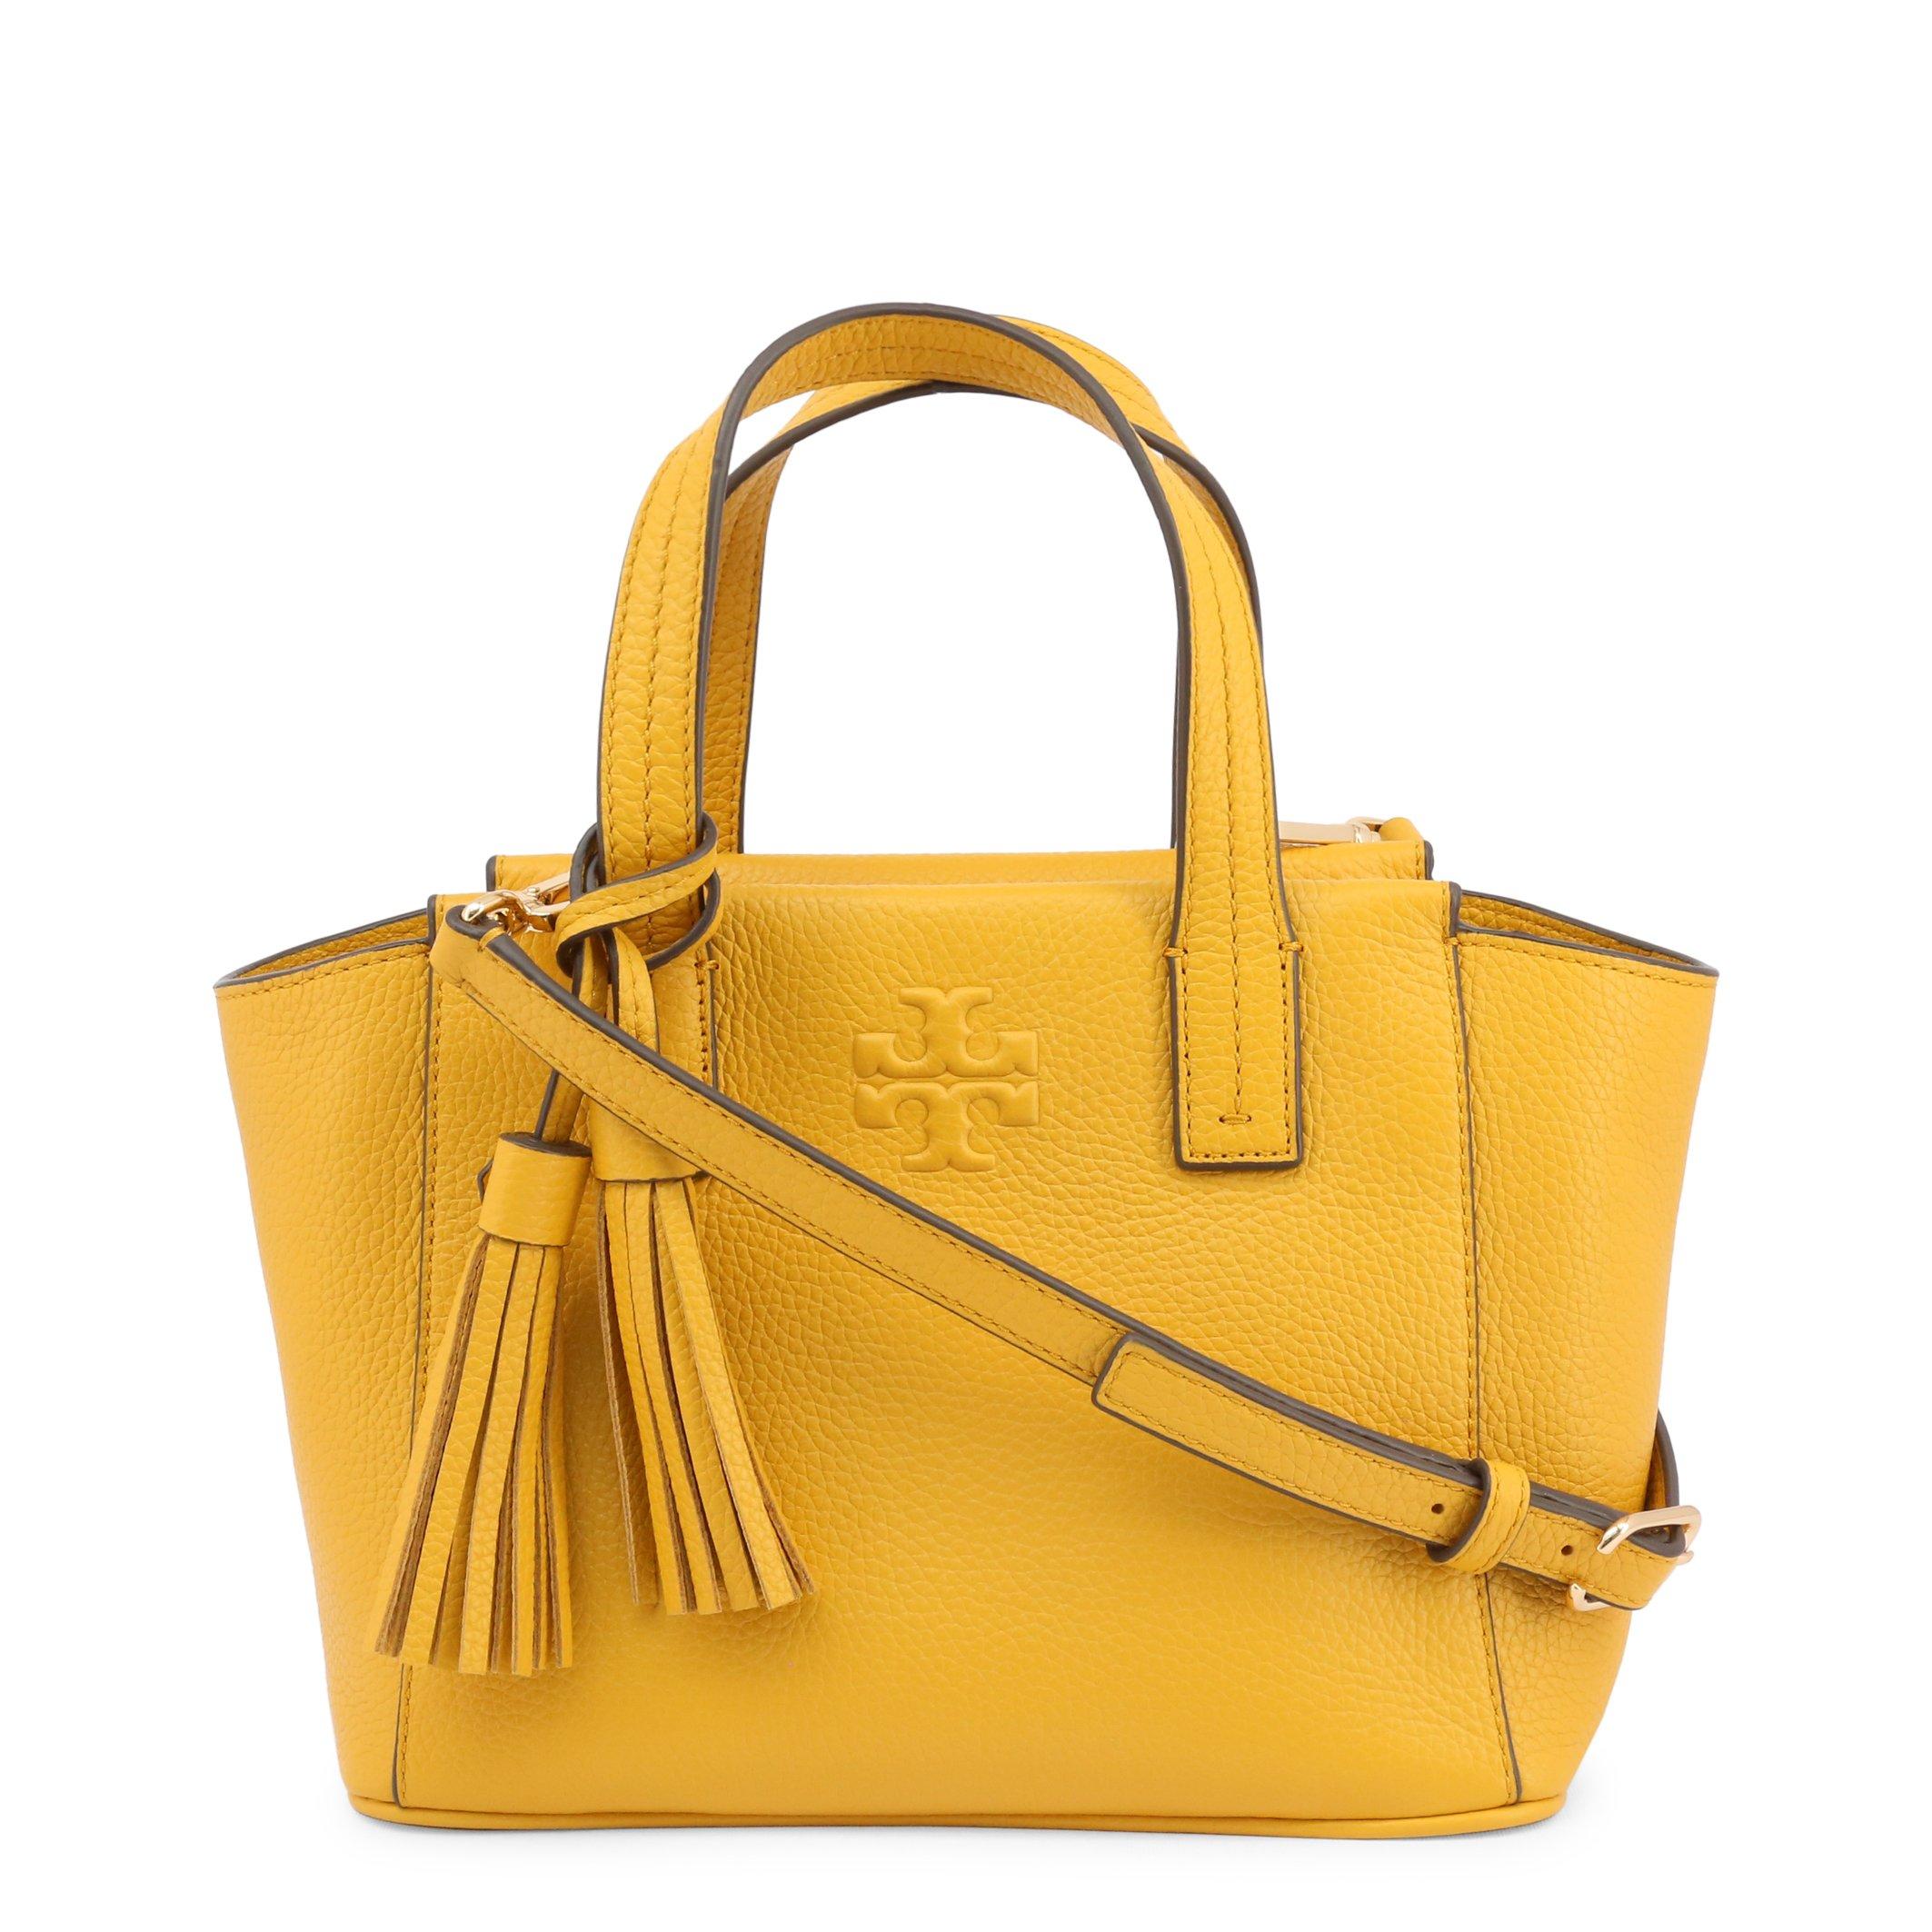 Tory Burch Women's Handbag Various Colours 77165 - yellow NOSIZE